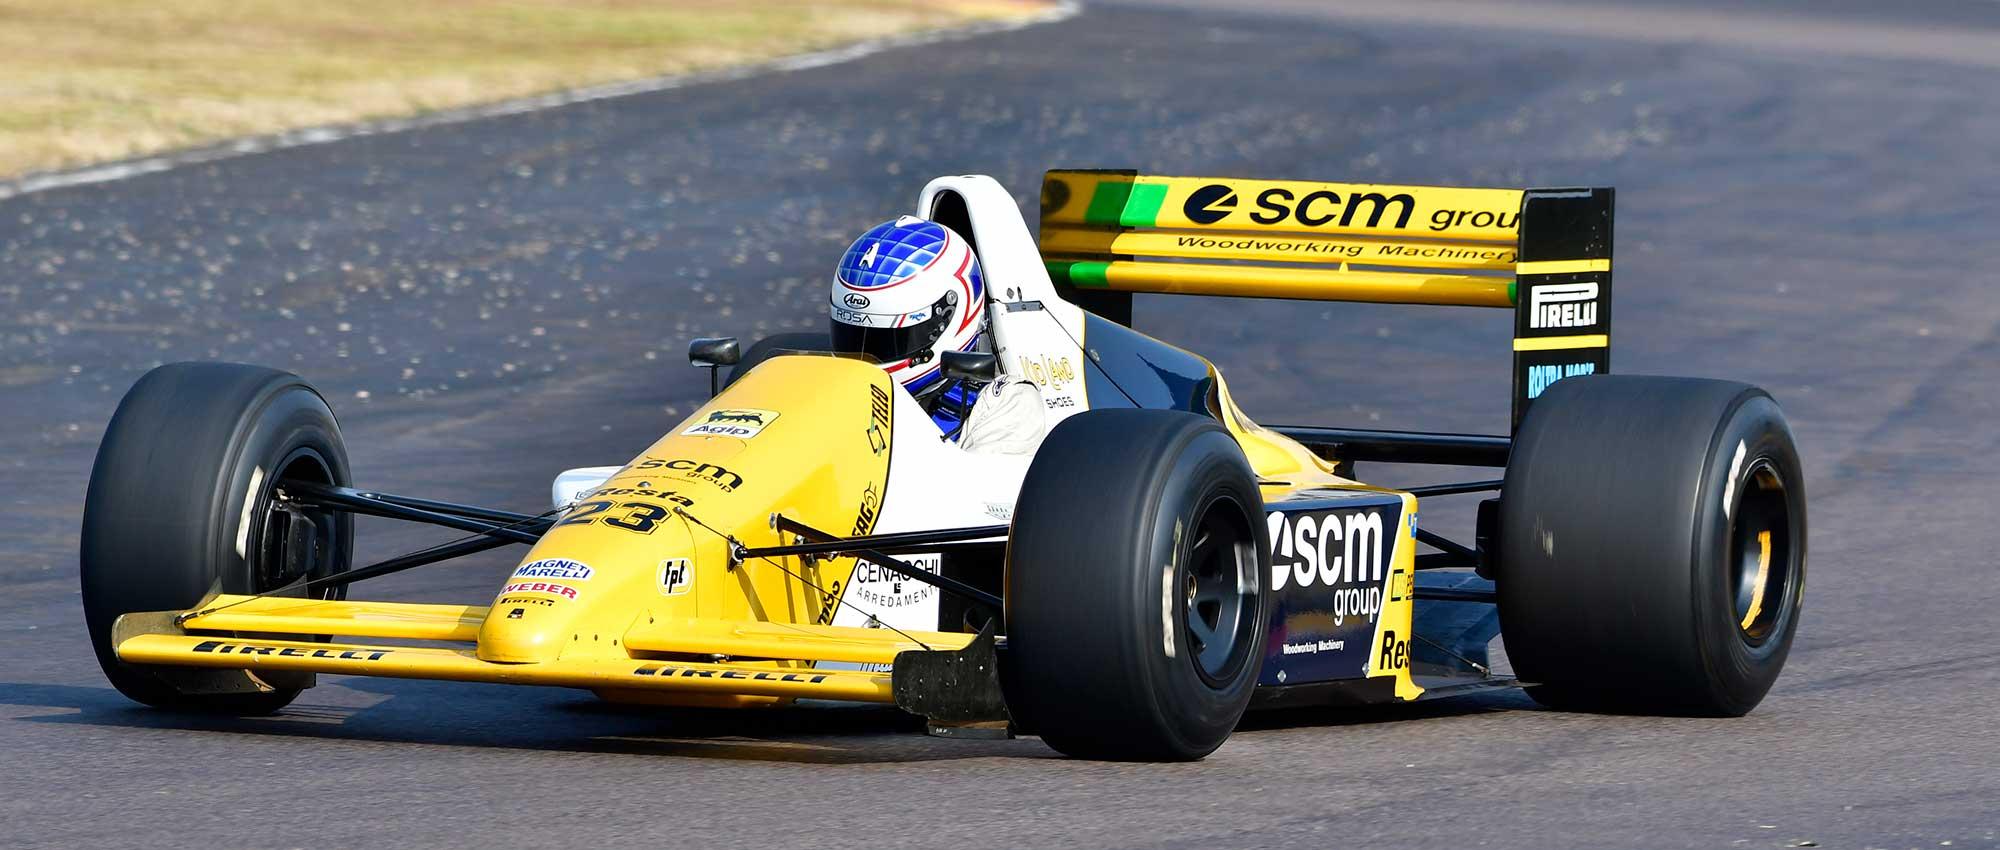 Ian-Schofield---1989-Minardi-M189-Cosworth---photo-Dave-Ledbitter---1